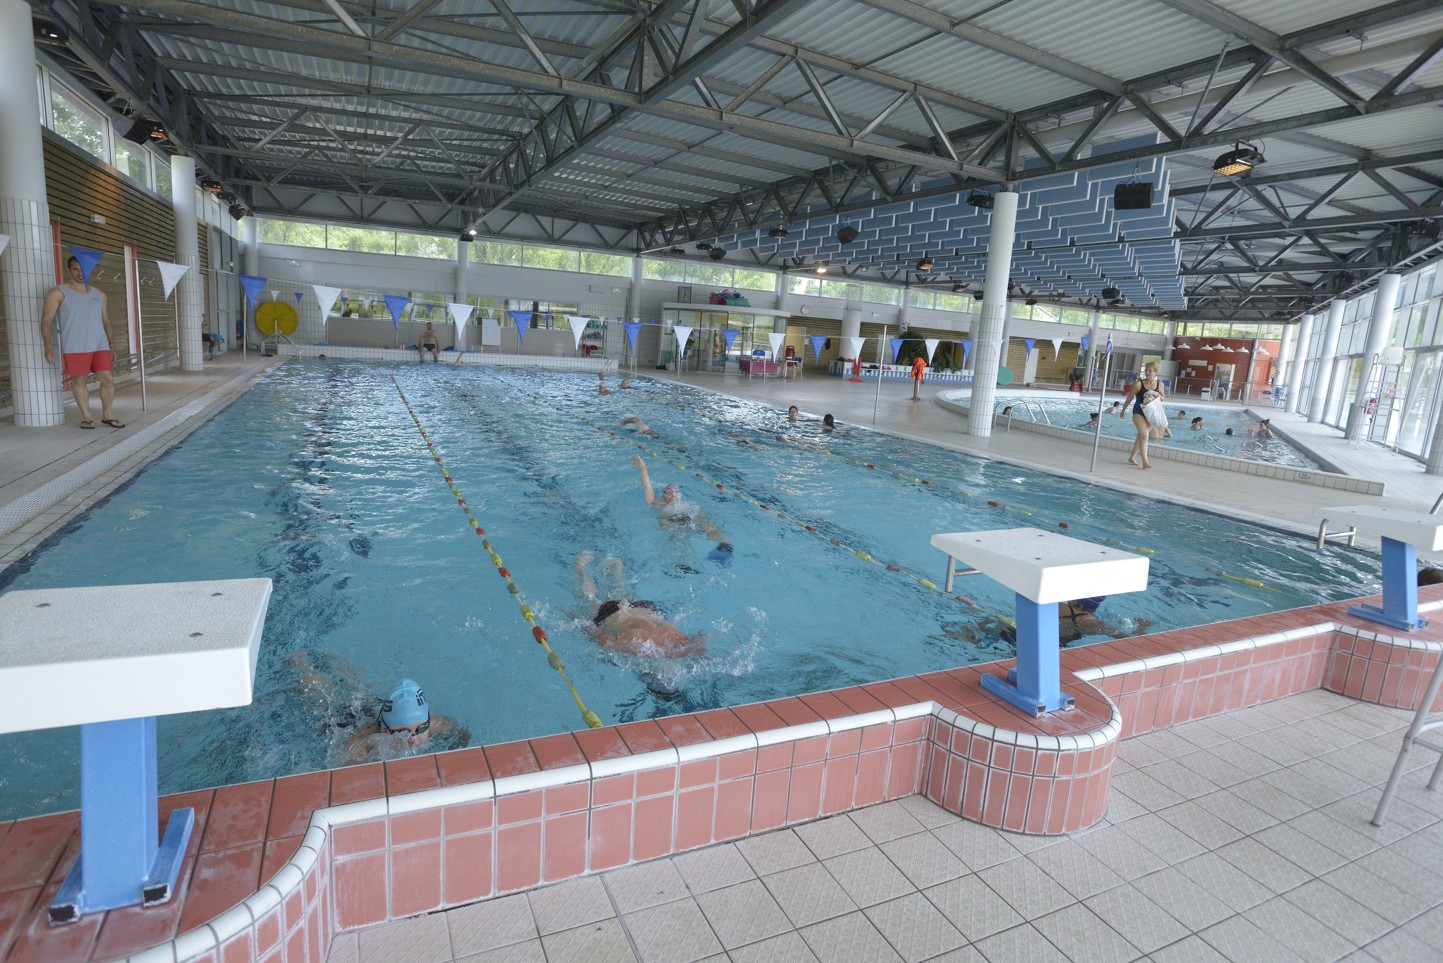 Centre Aquatique Bleu Rive concernant Piscine Saint Vallier